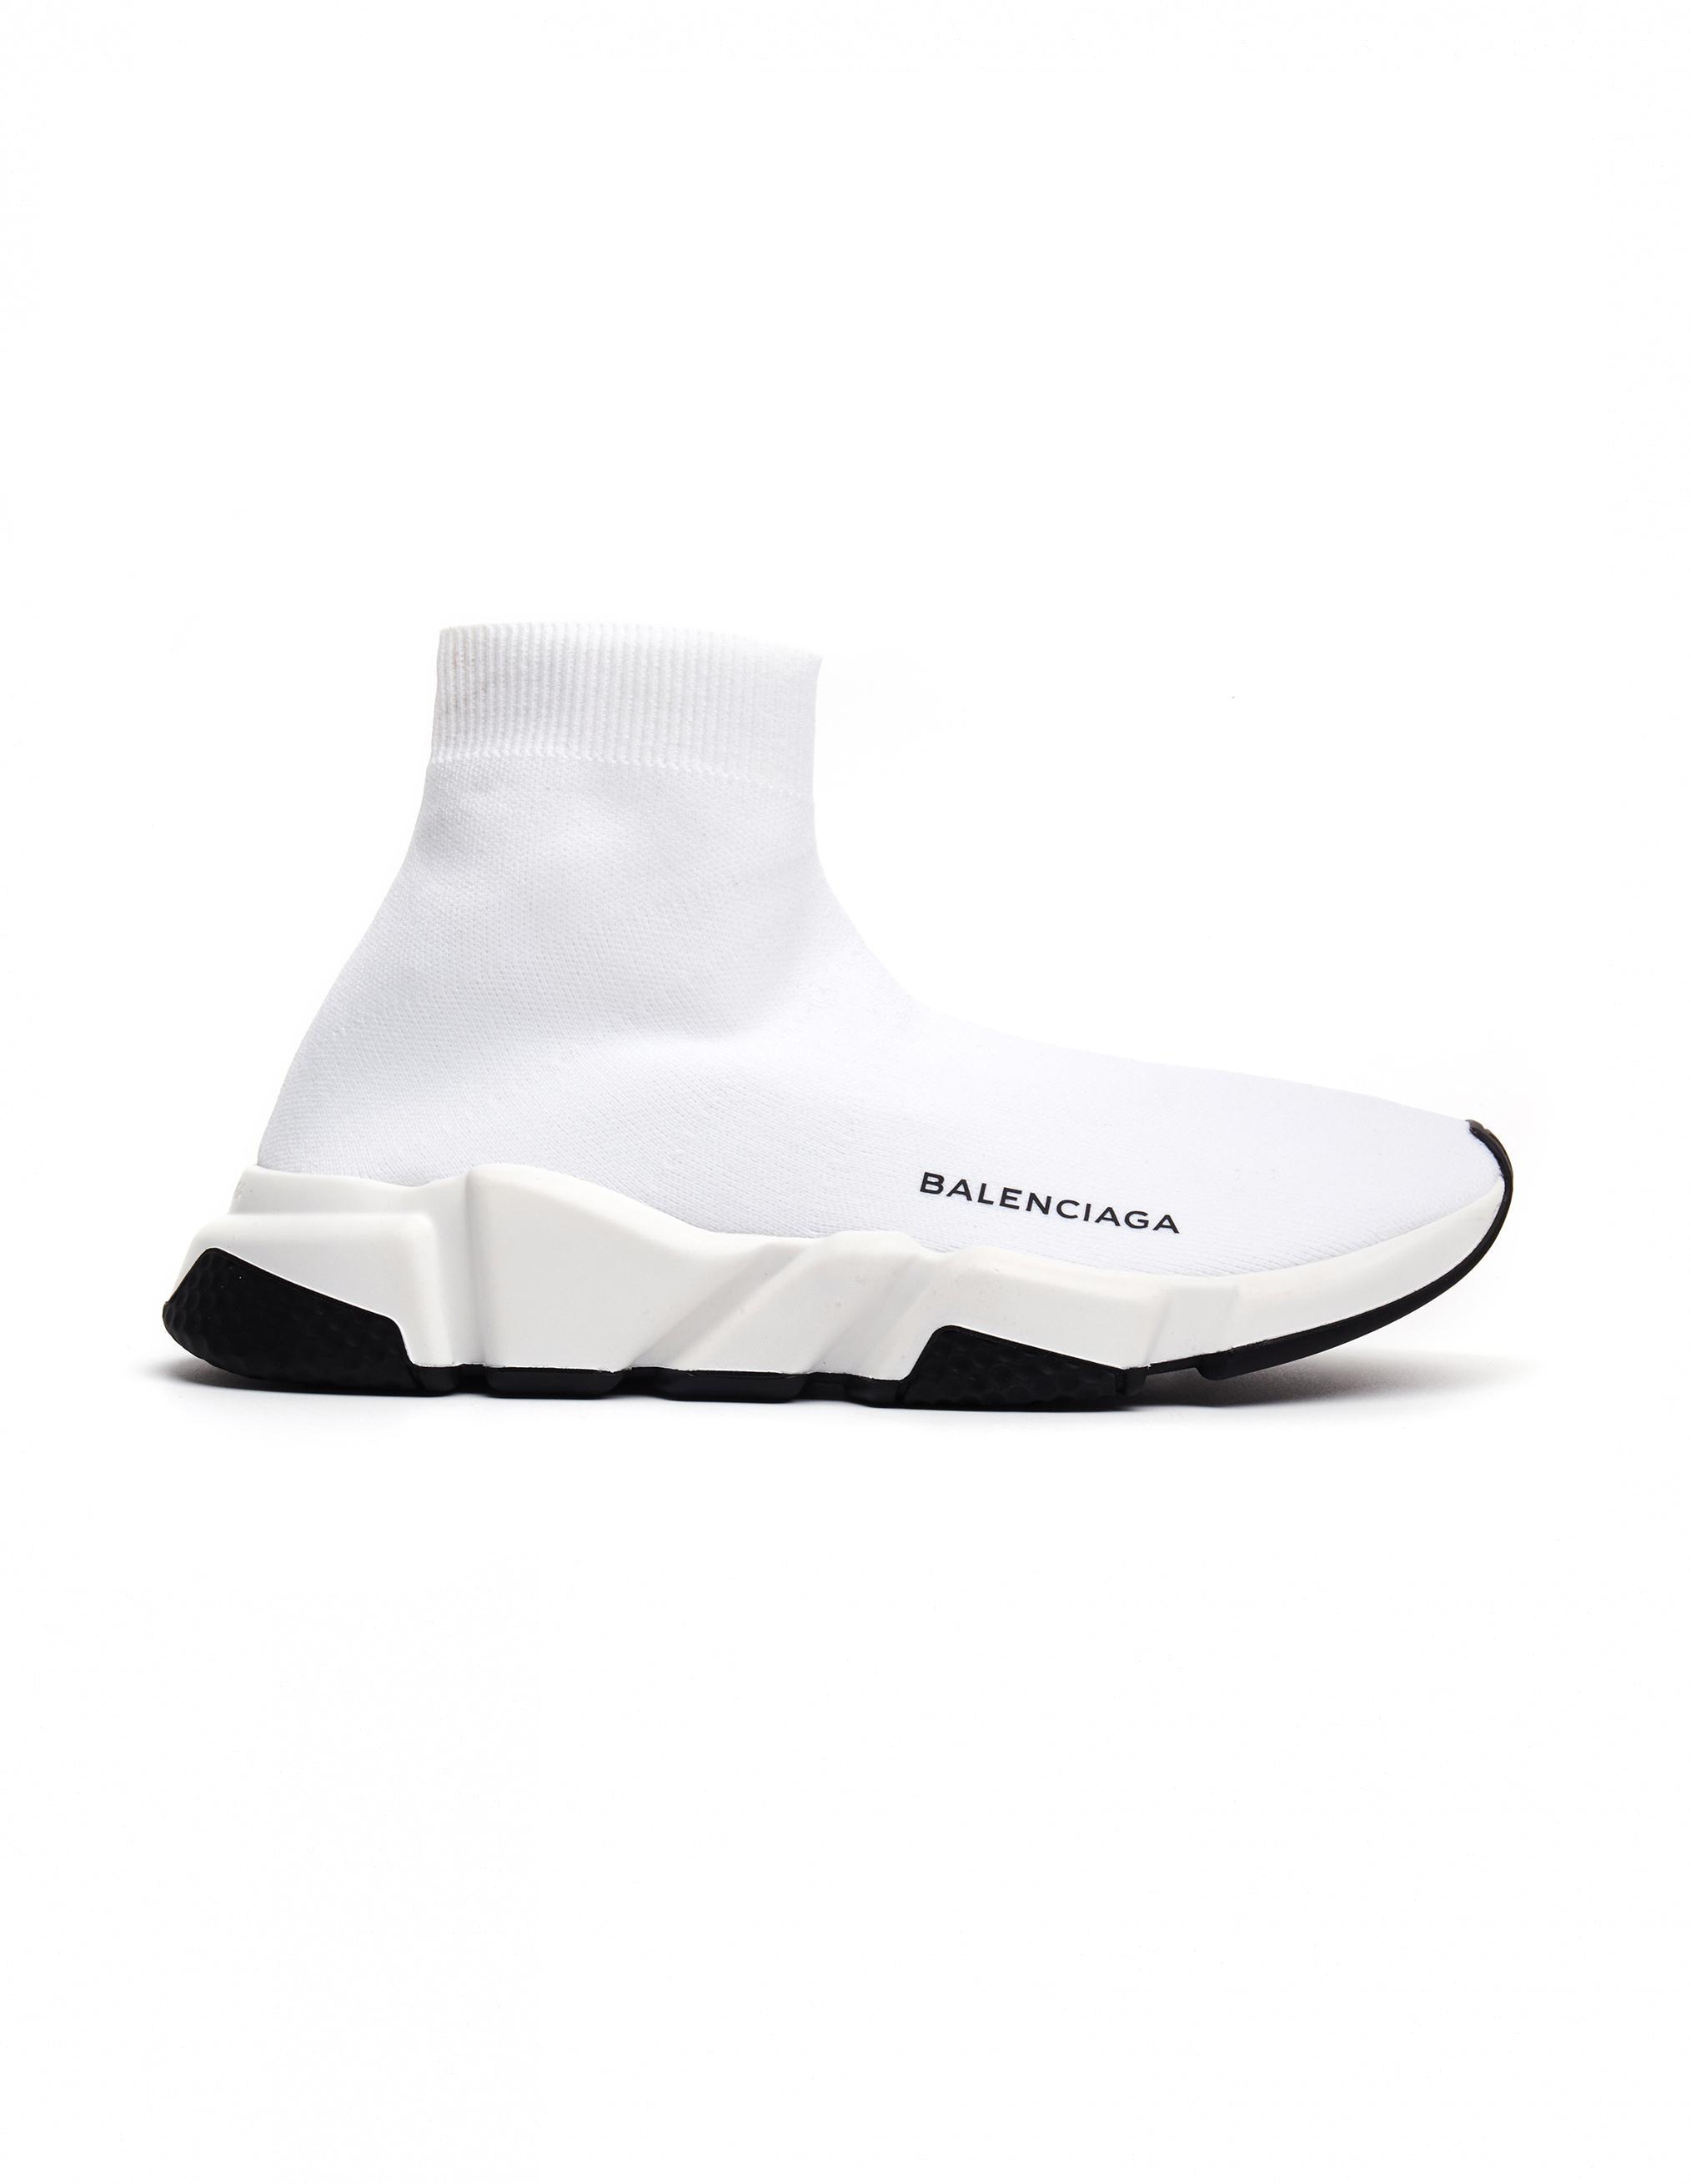 eb33d5ea6ba0 Lyst - Balenciaga Speed Trainers in White - Save 12%